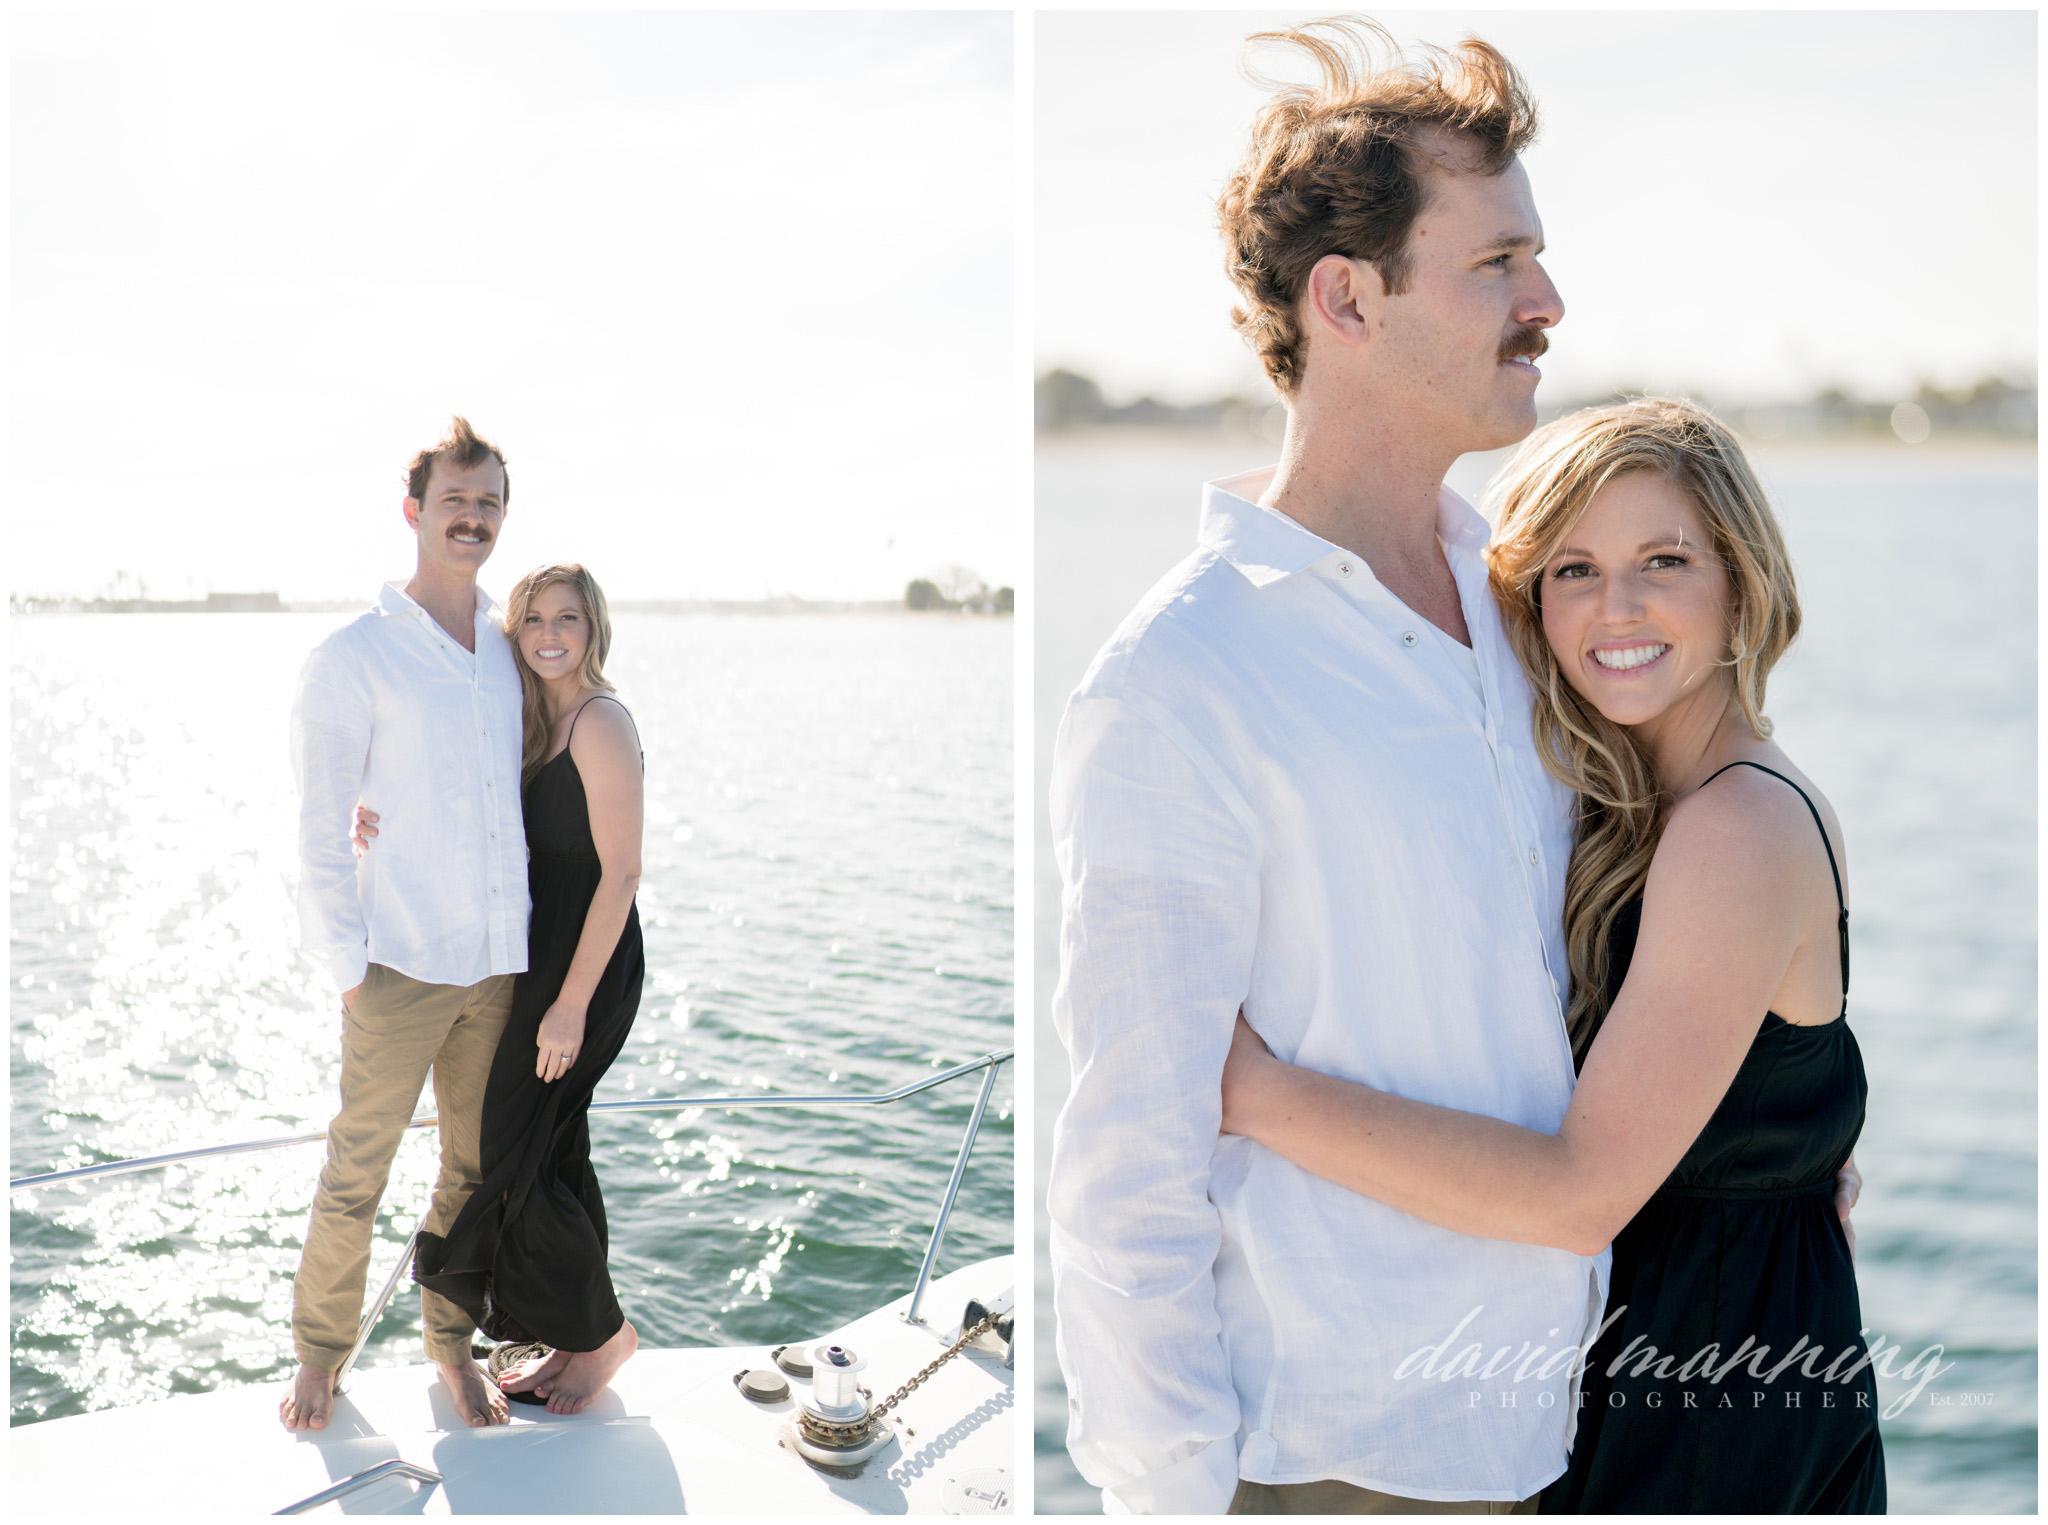 Alyssa-Taylor-Engagement-David-Manning-Photographer-0057.JPG